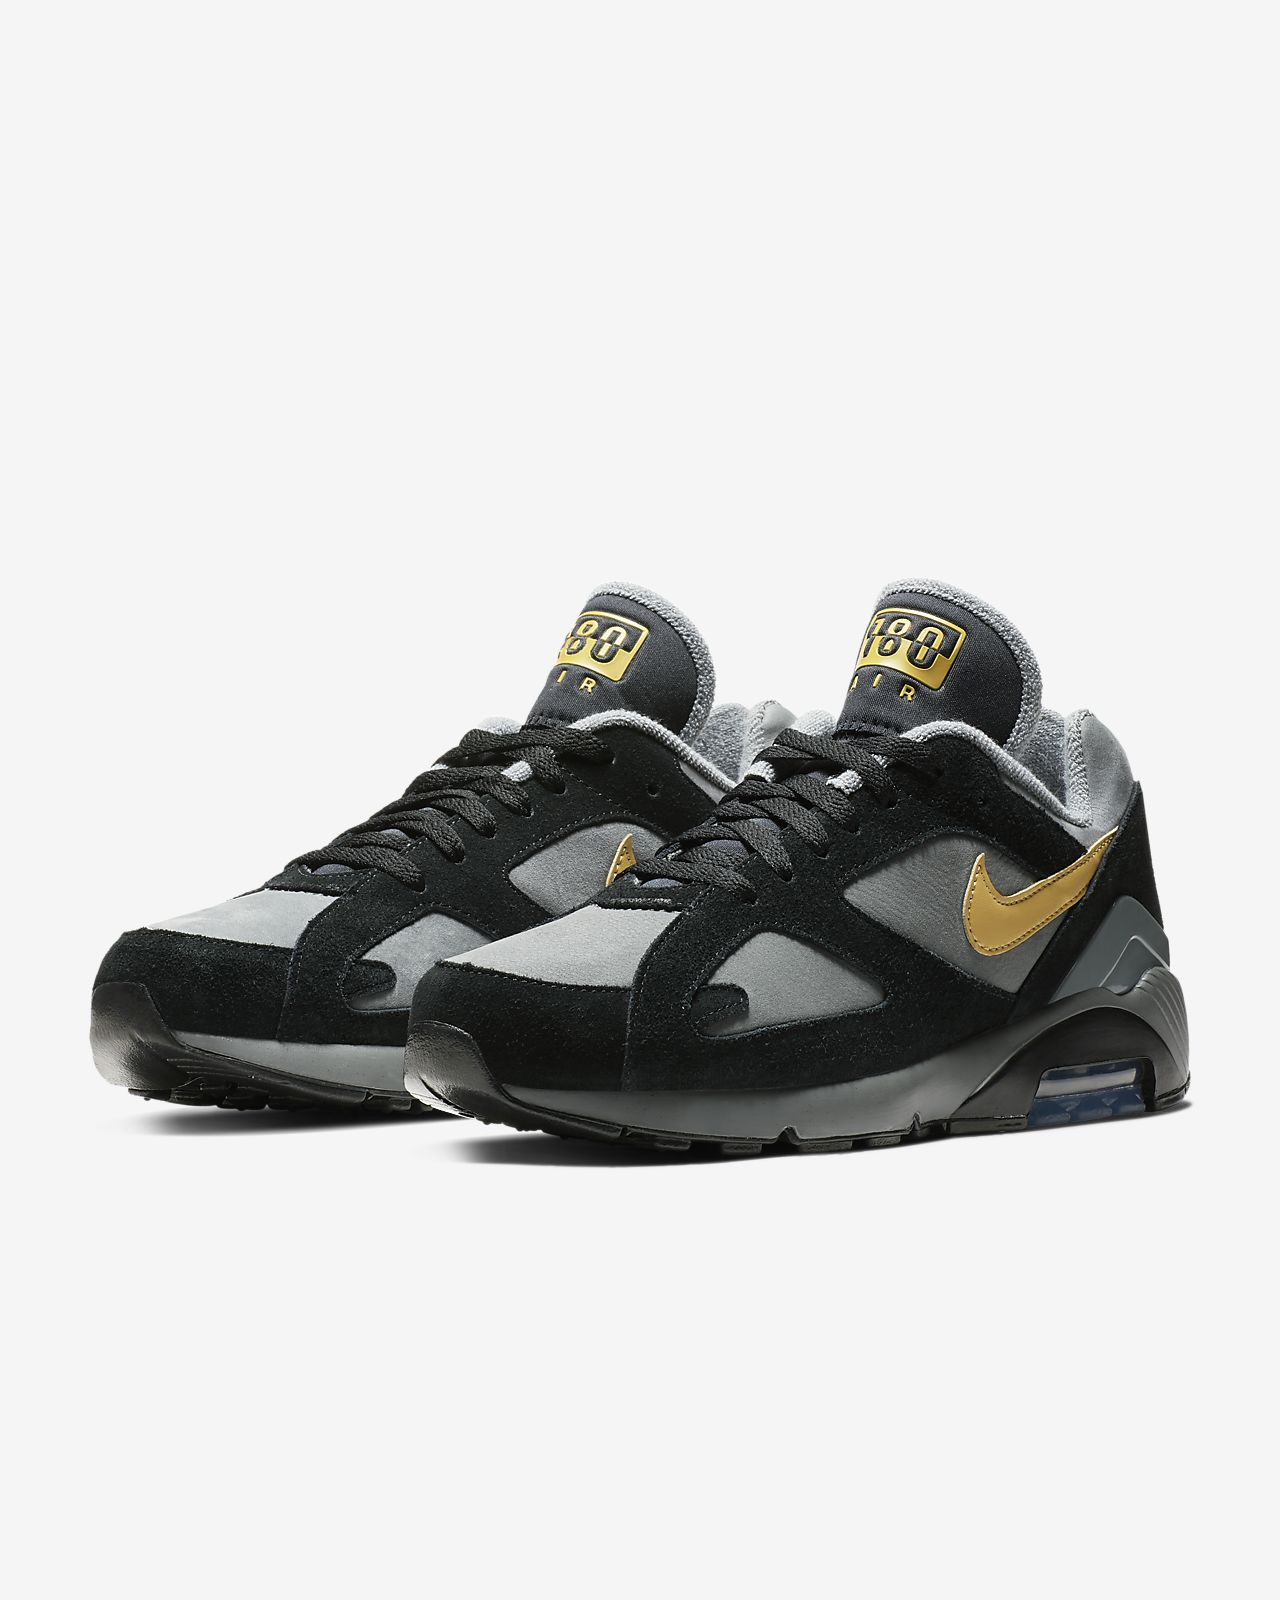 timeless design 84e7d 12bae ... Nike Air Max 180-sko til mænd